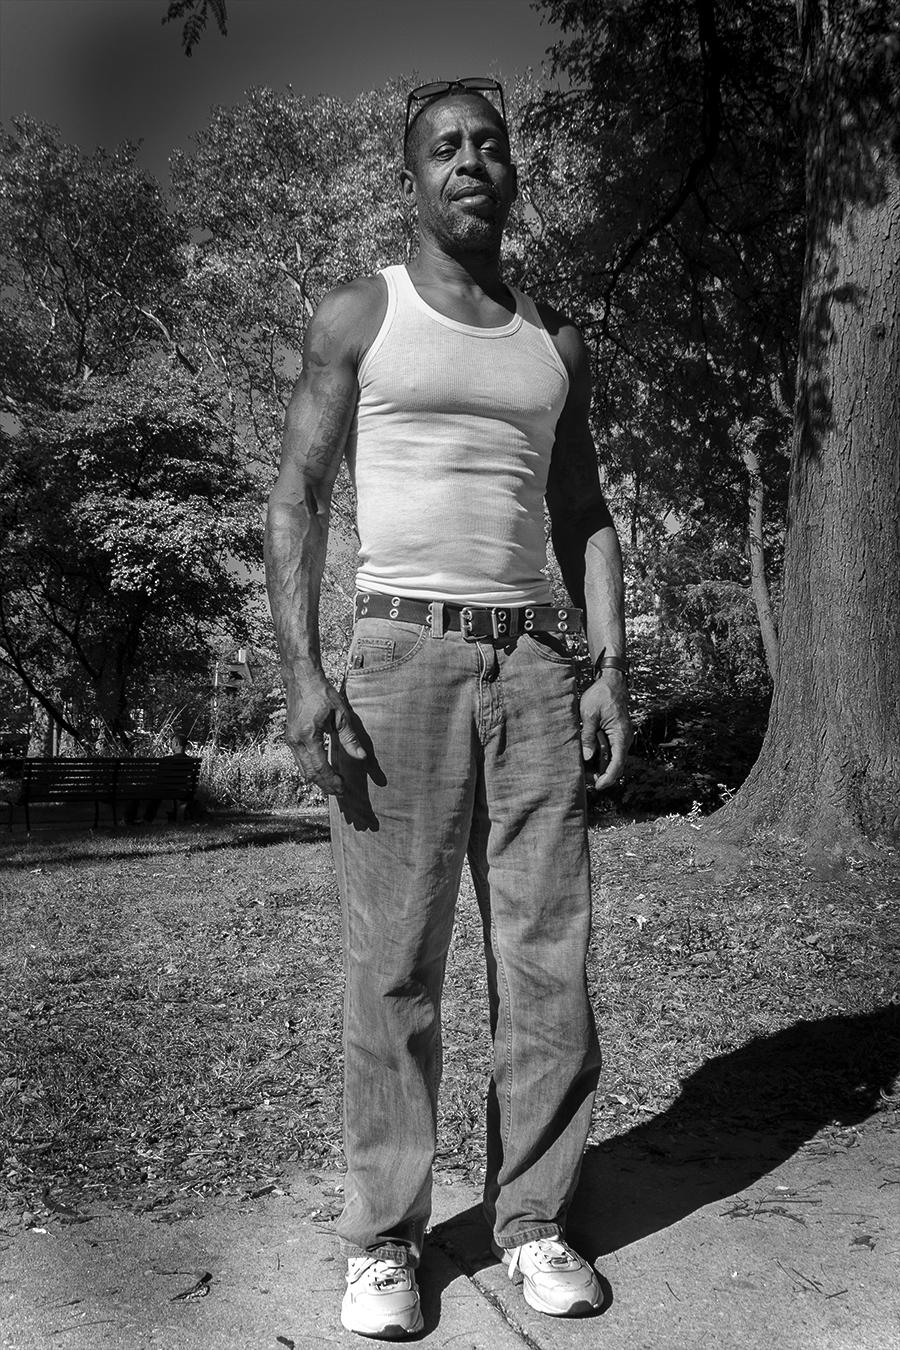 Jingwen_Felix_Qiang_Photography_Food_Truck_Man_Heroic_White_Shirt_West_Philly_Street_Baltimore